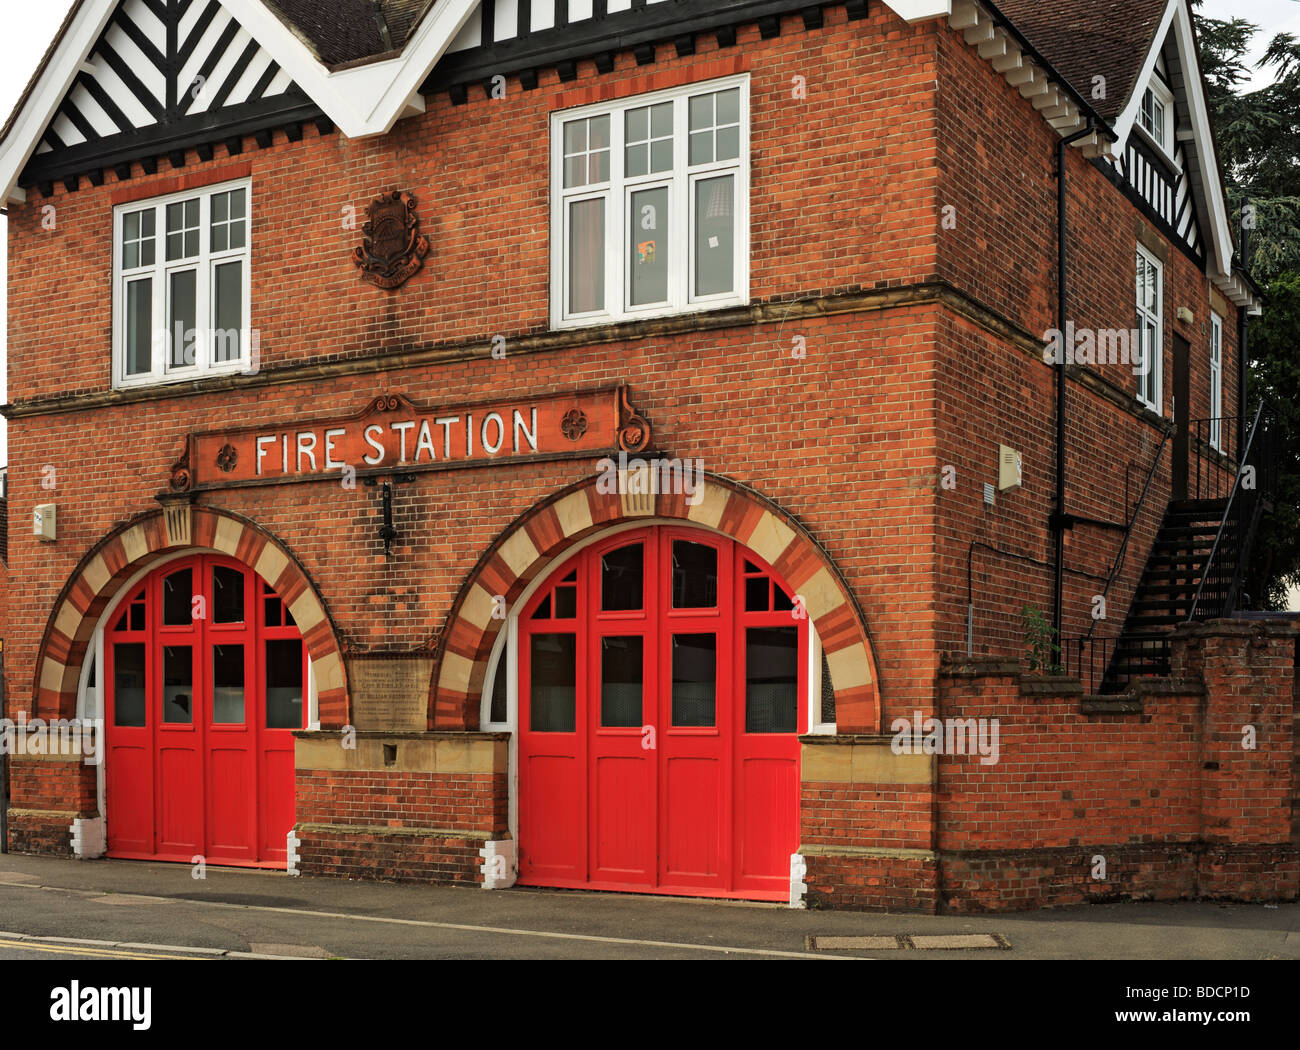 Fire Station entrance. - Stock Image